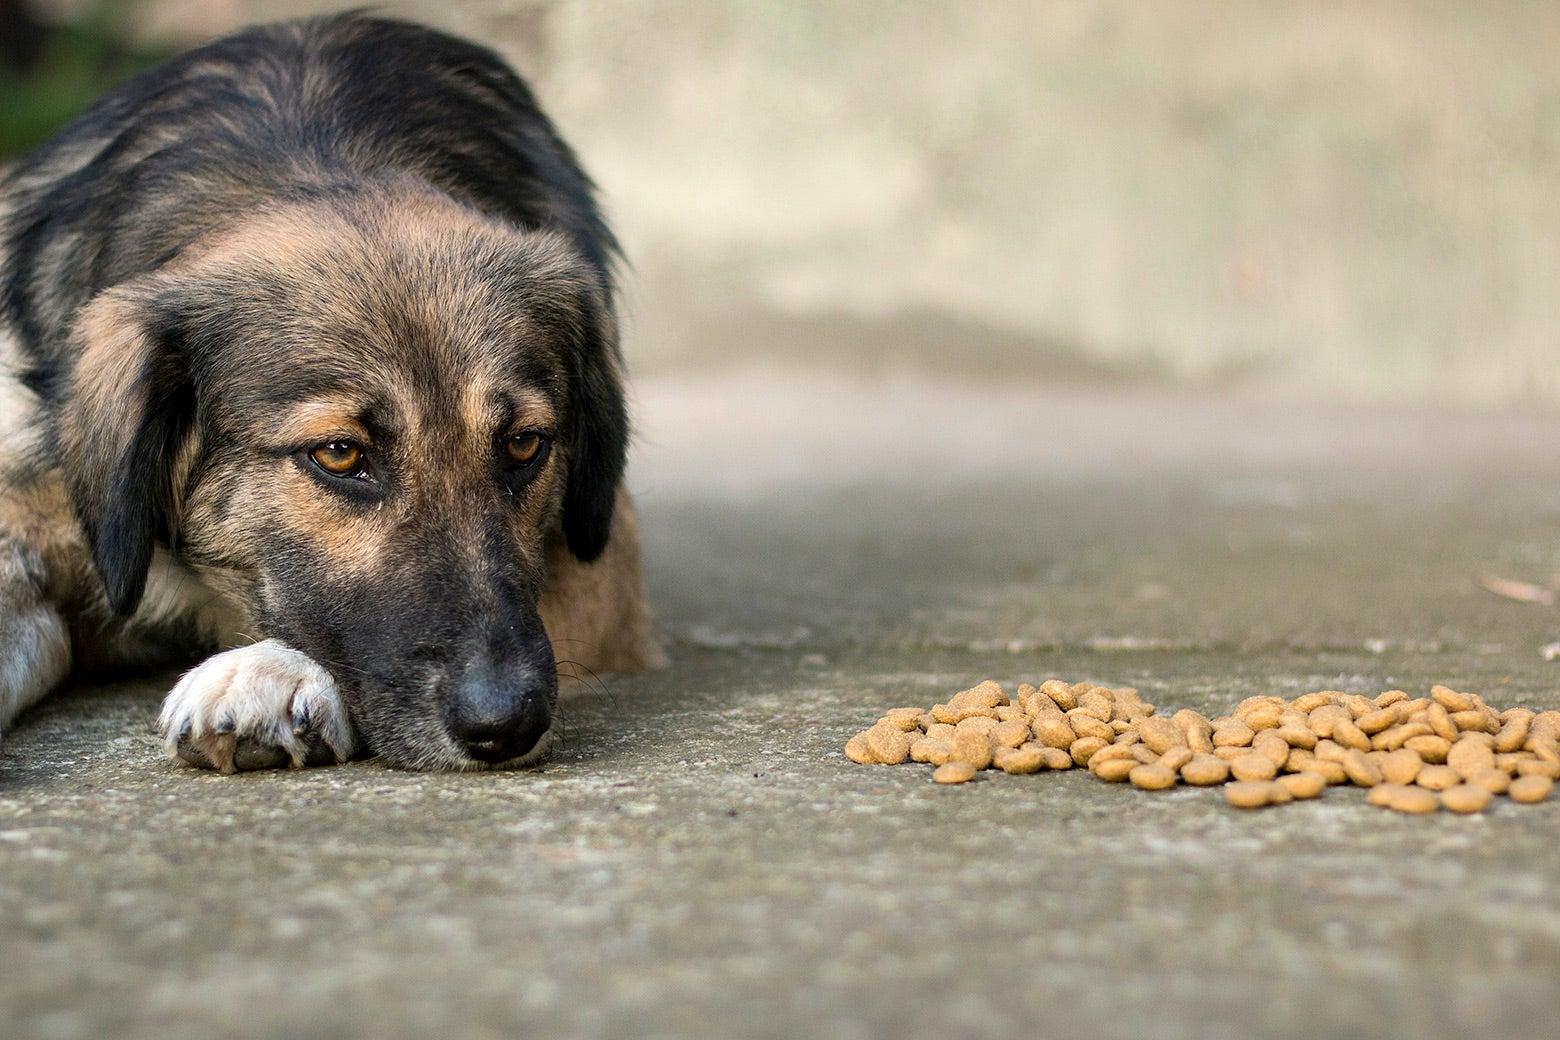 A sad dog not eating his food.